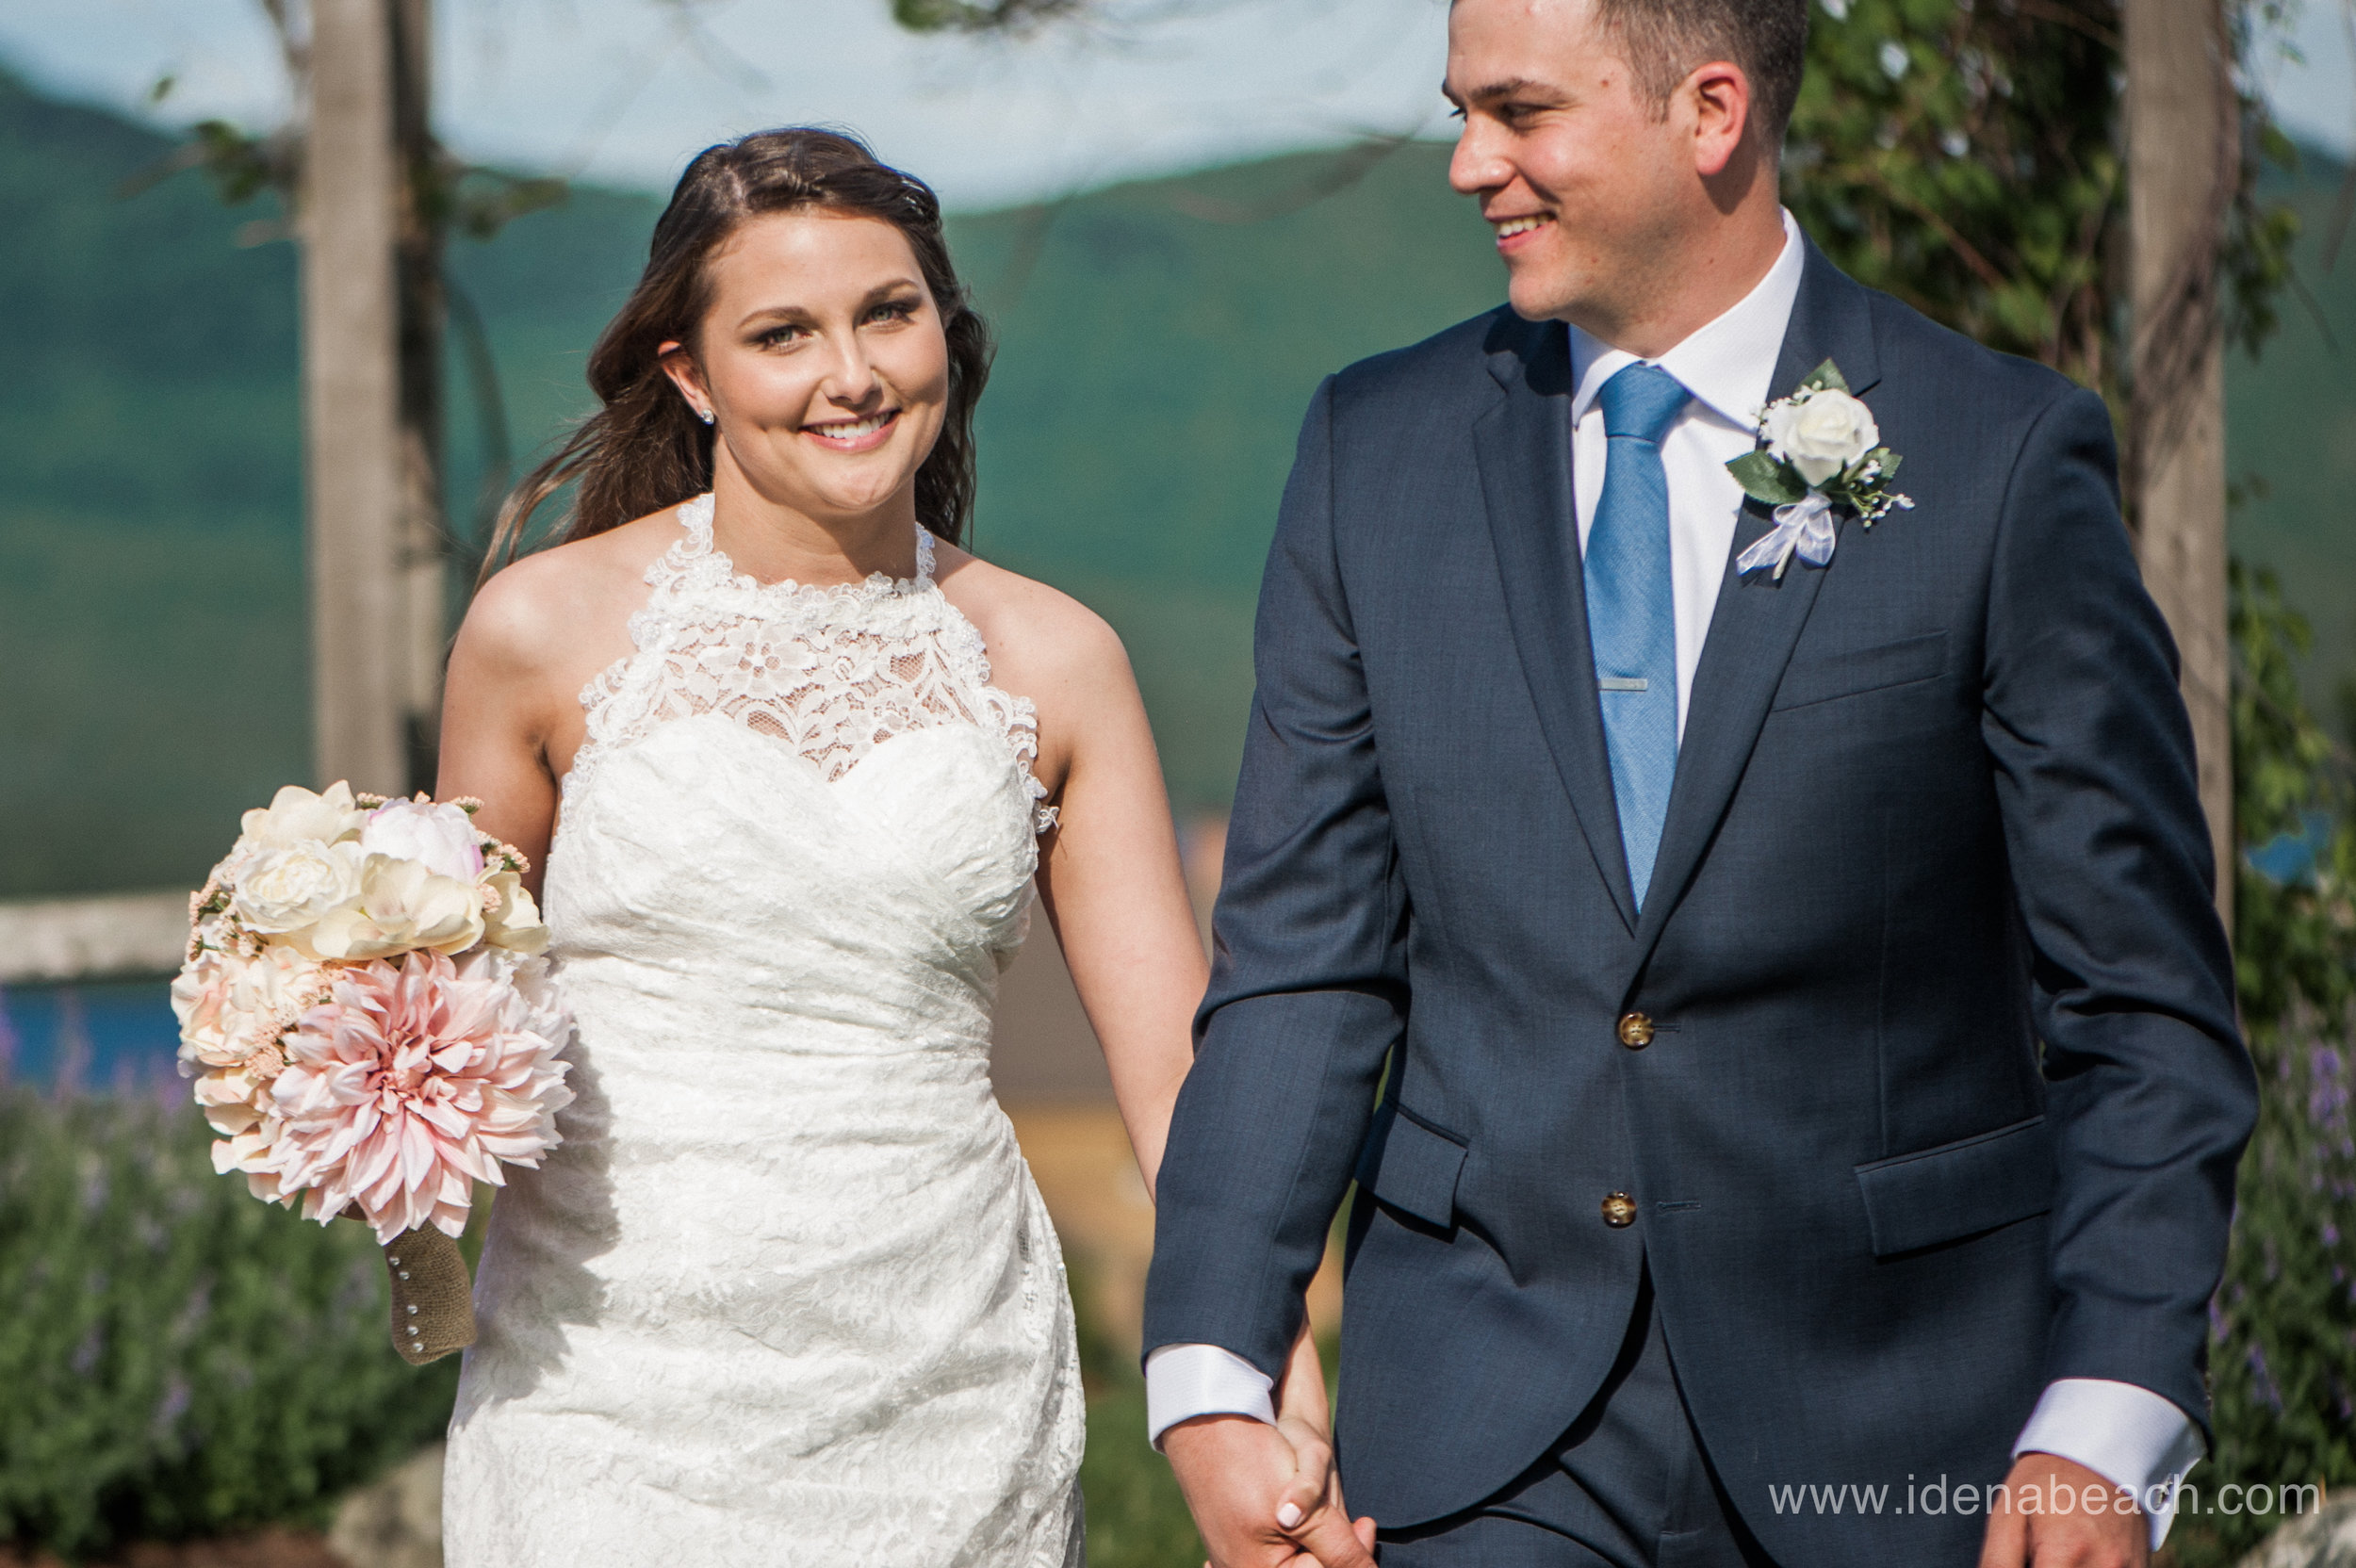 Mountain-Top-Inn-Vermont-Wedding-Photographer-67.jpg